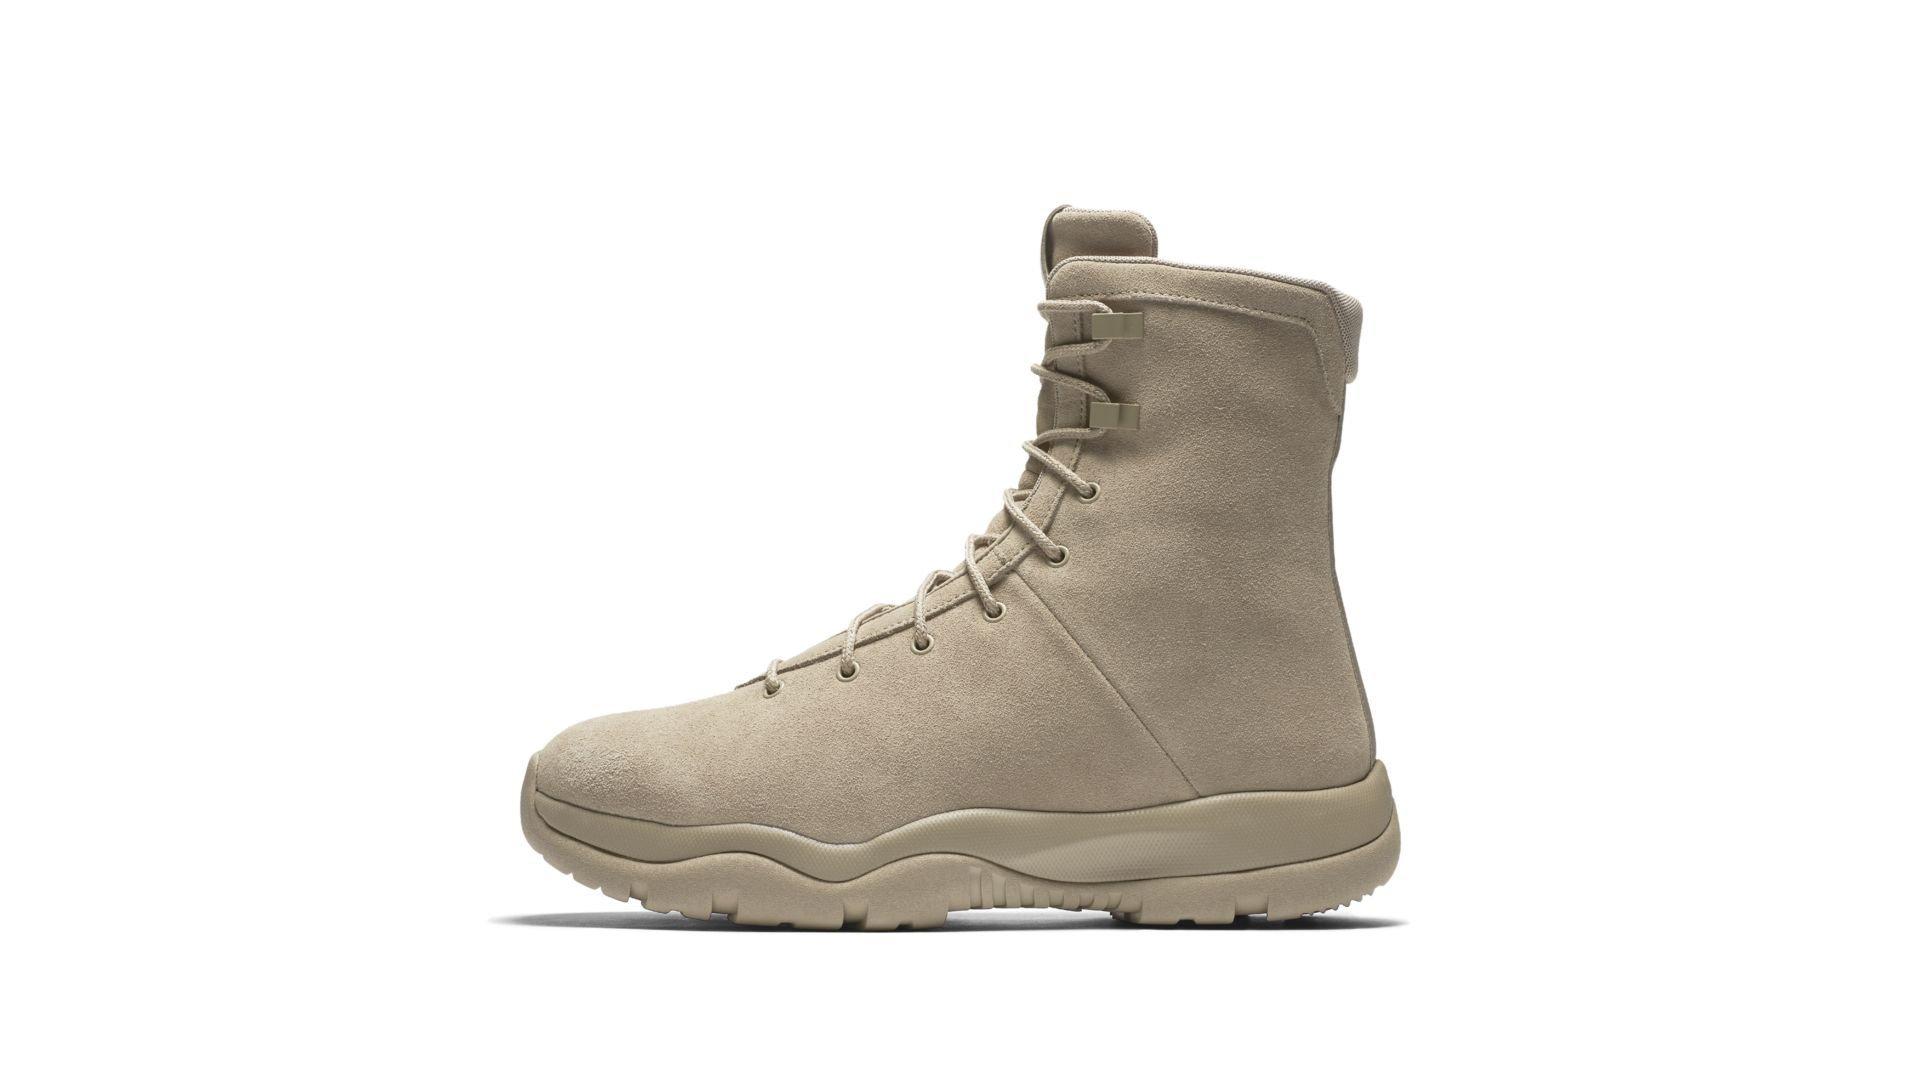 Jordan Future Boot Khaki (878222-205)